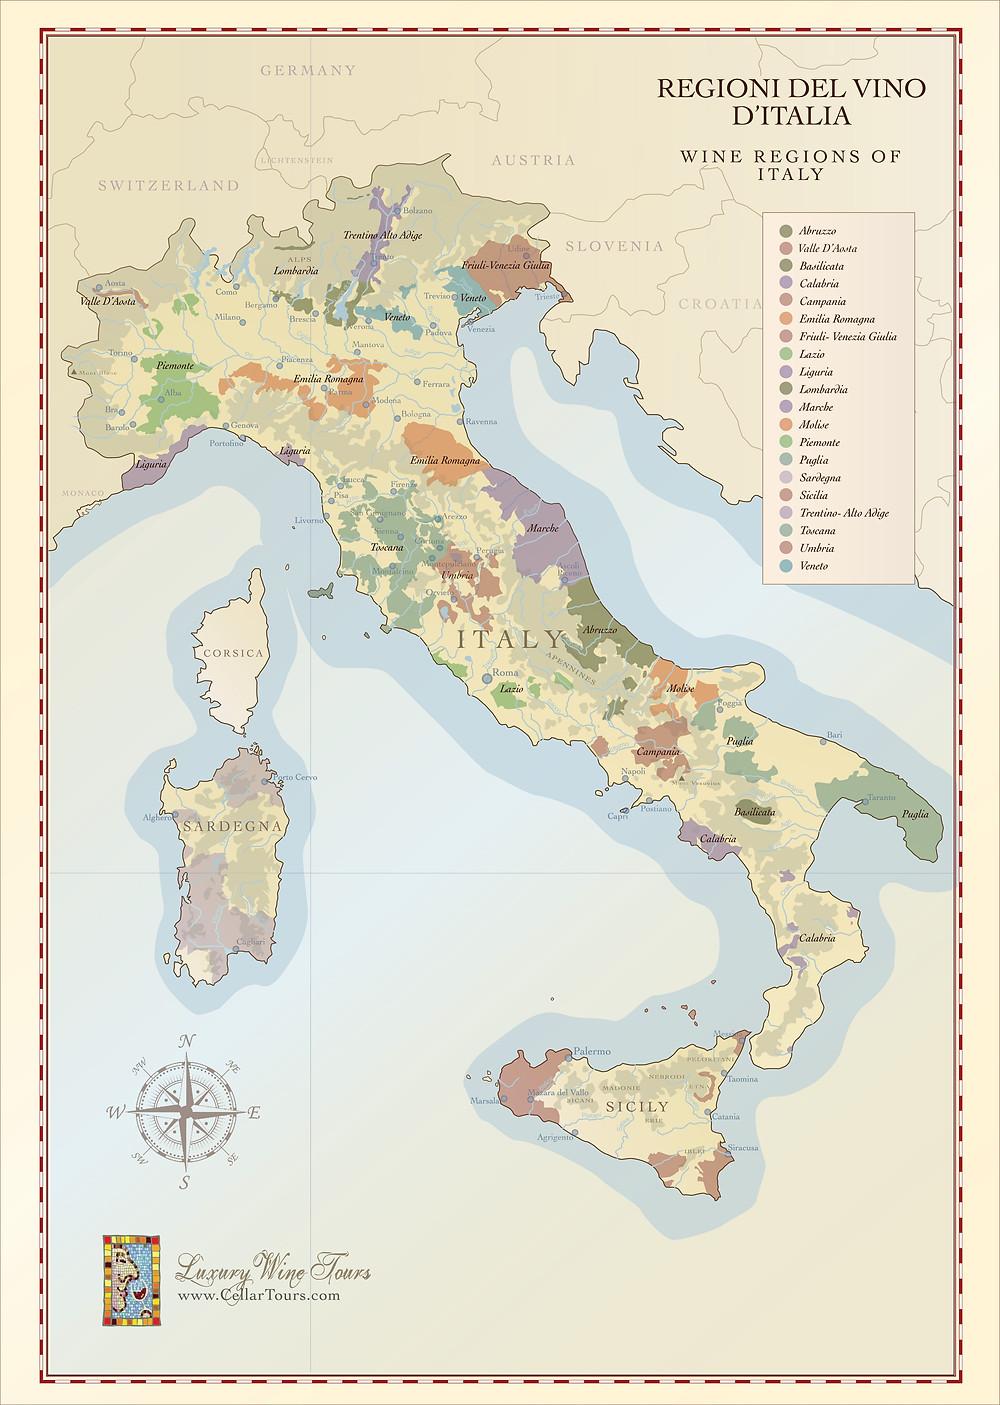 Wine Regions of Italy Map Courtesy of CellarTours.com